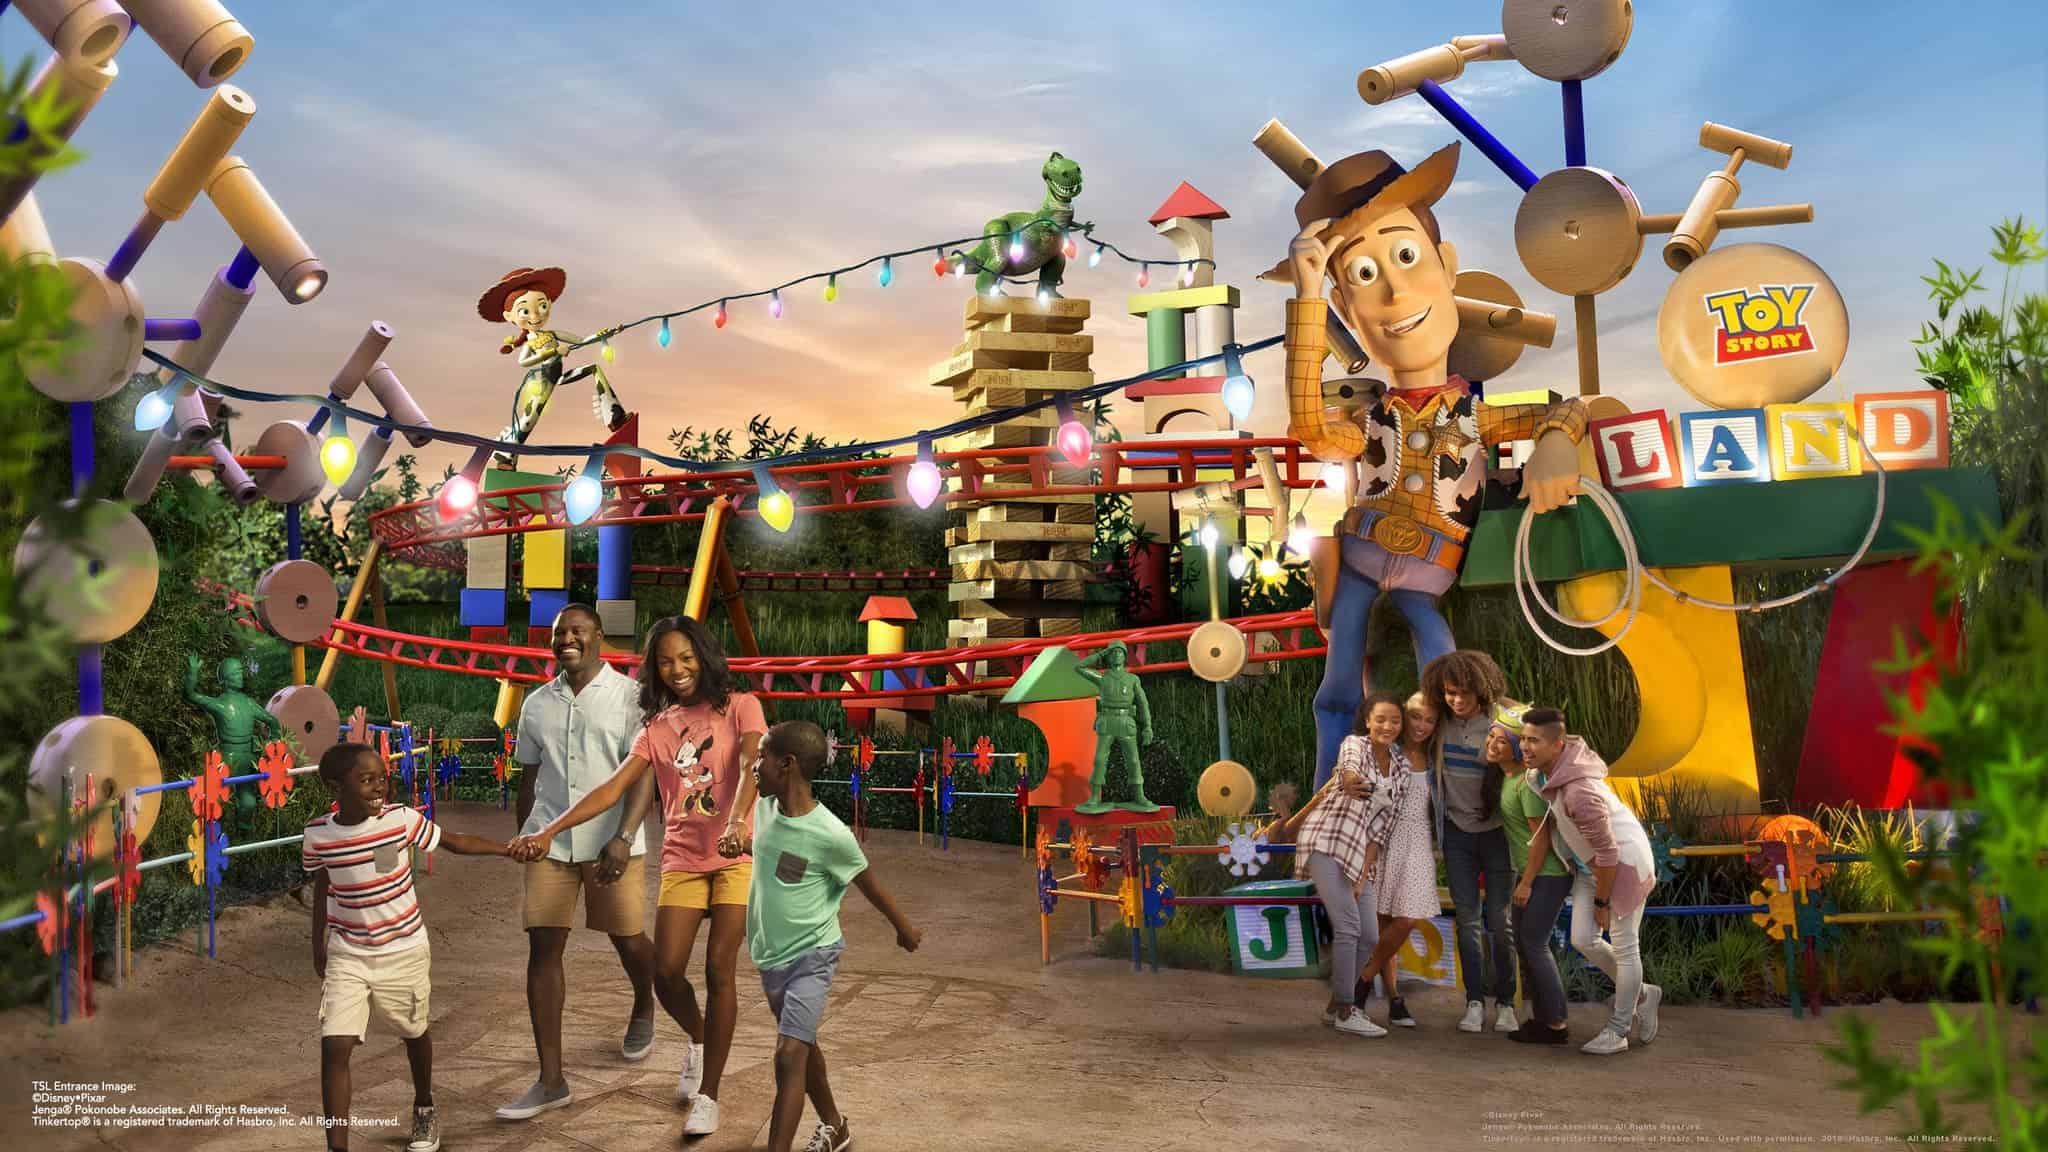 HOW TO LISTEN | DParkRadio Disney Theme Park Music 24/7